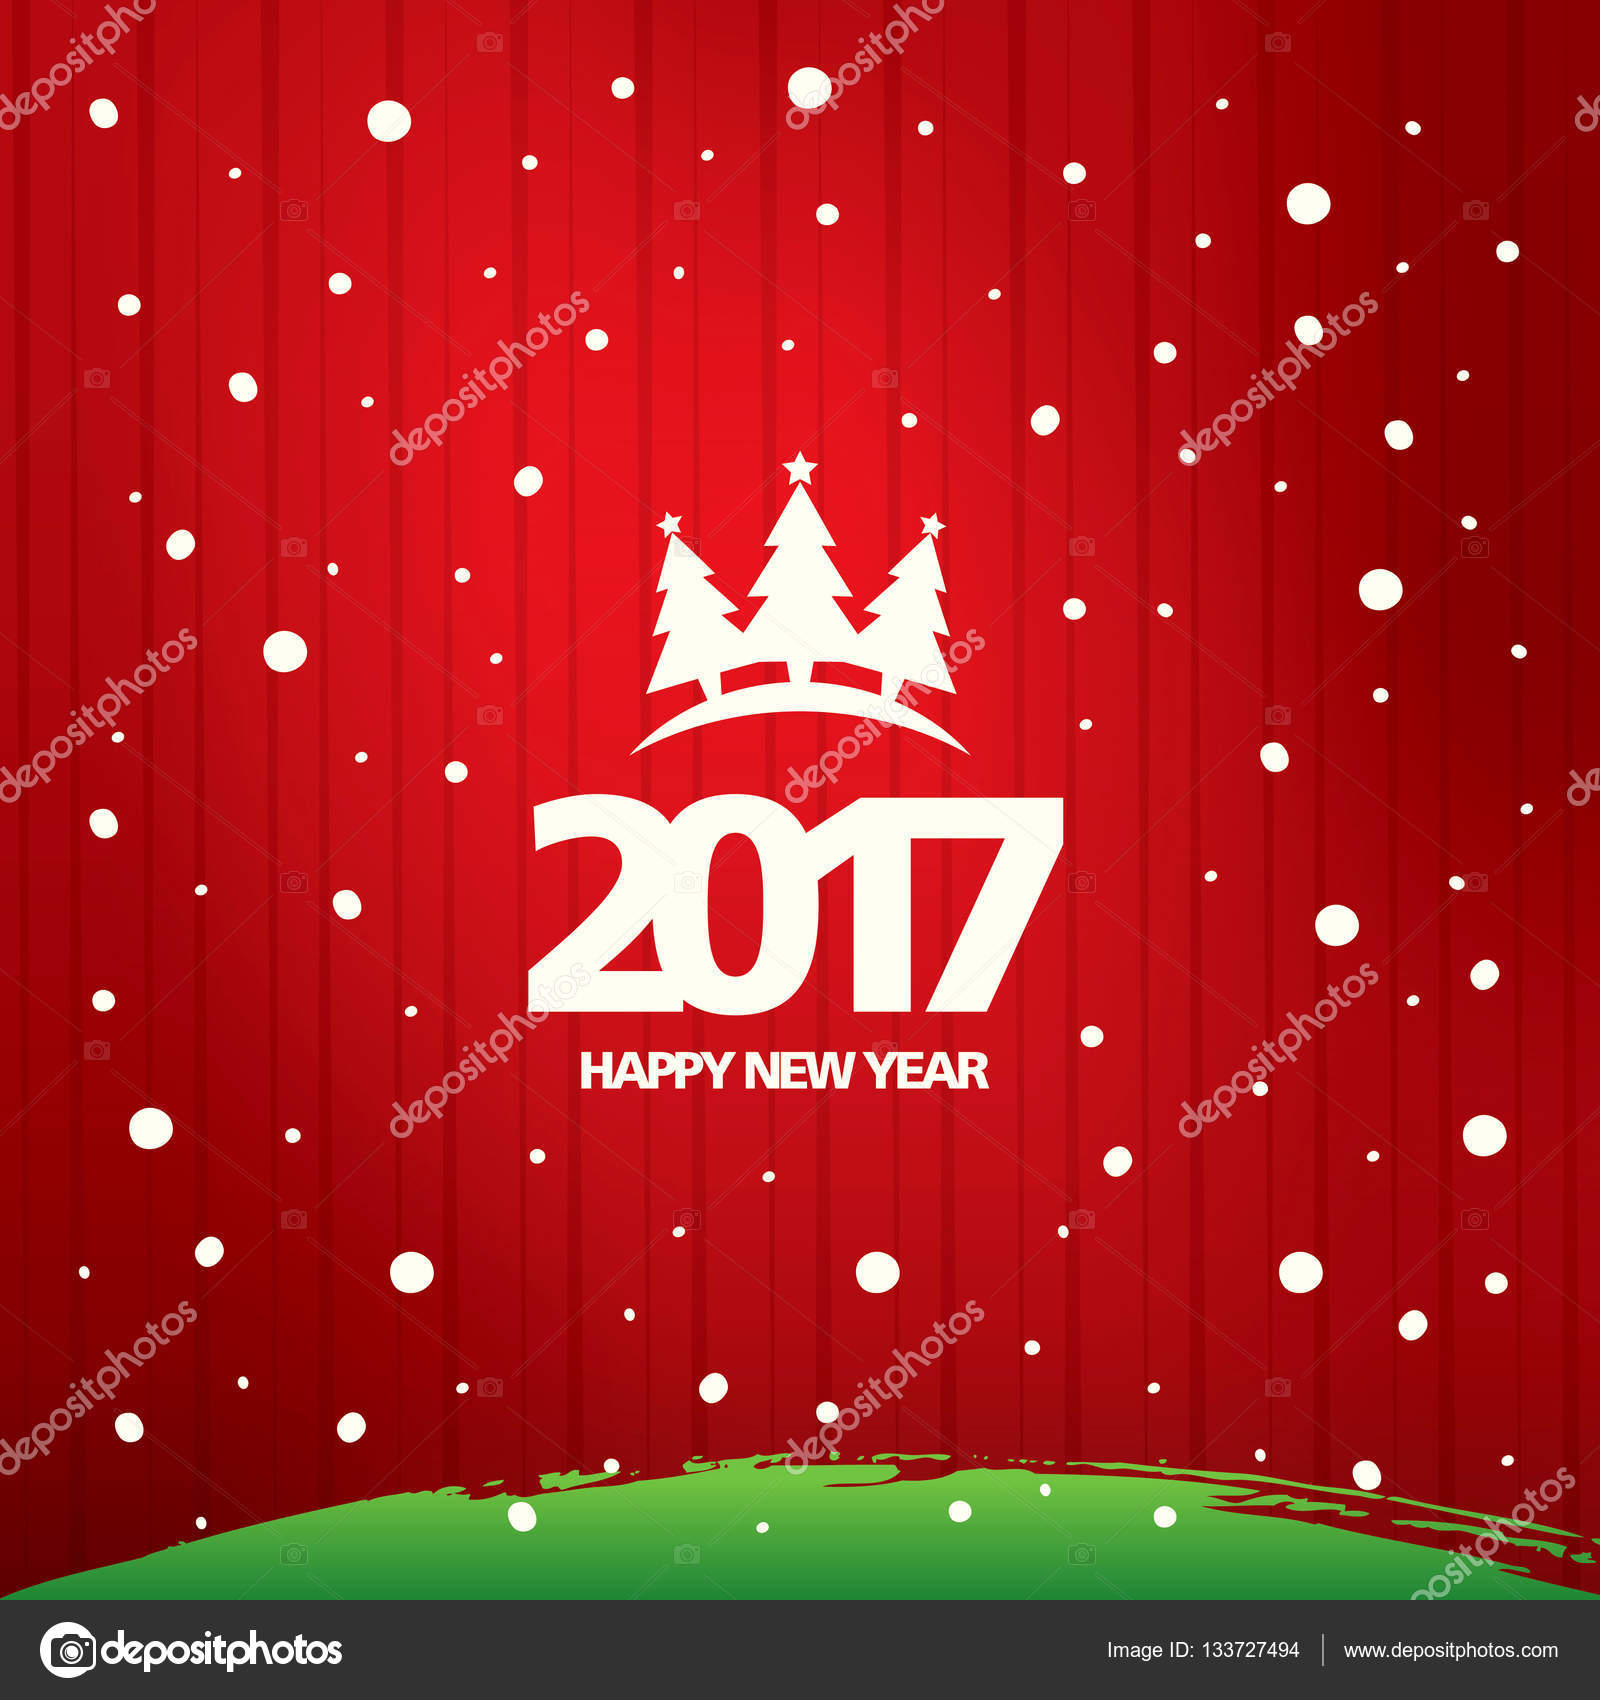 New year greeting card stock vector igorvkv 133727494 new year greeting card stock vector kristyandbryce Images